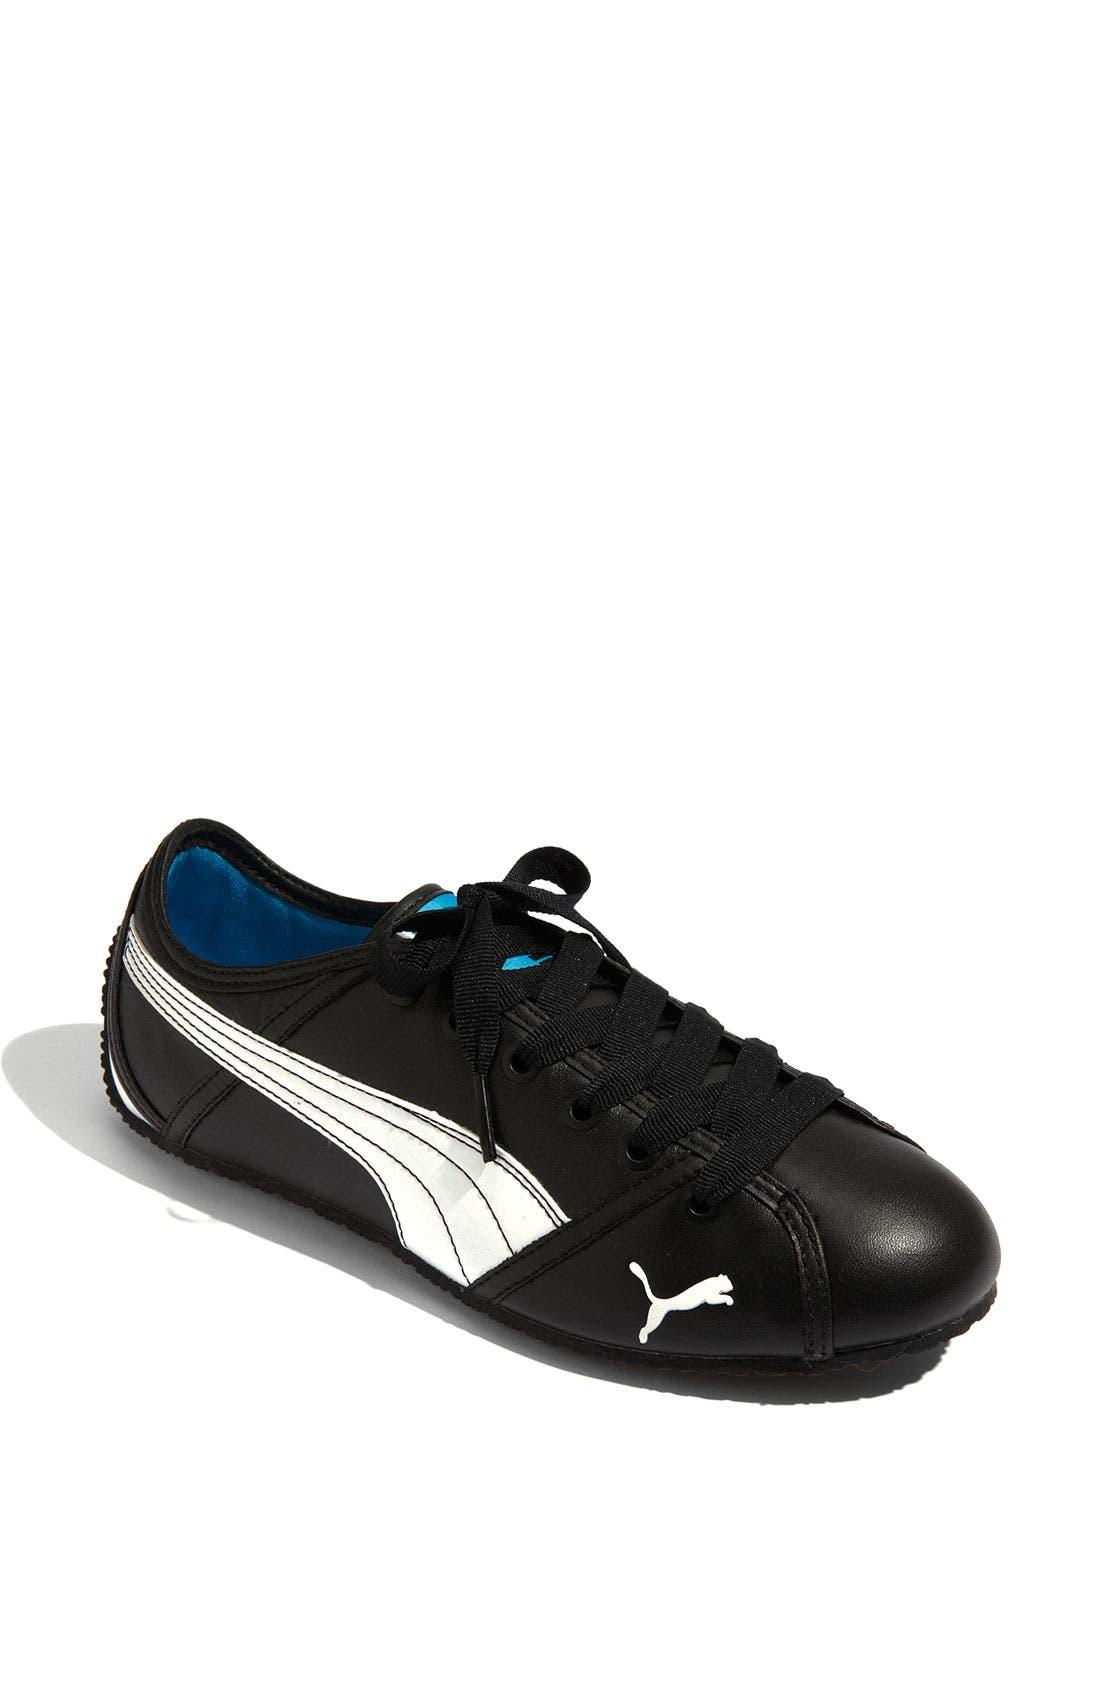 Main Image - PUMA 'Style Cat' Racing Sneaker (Women)